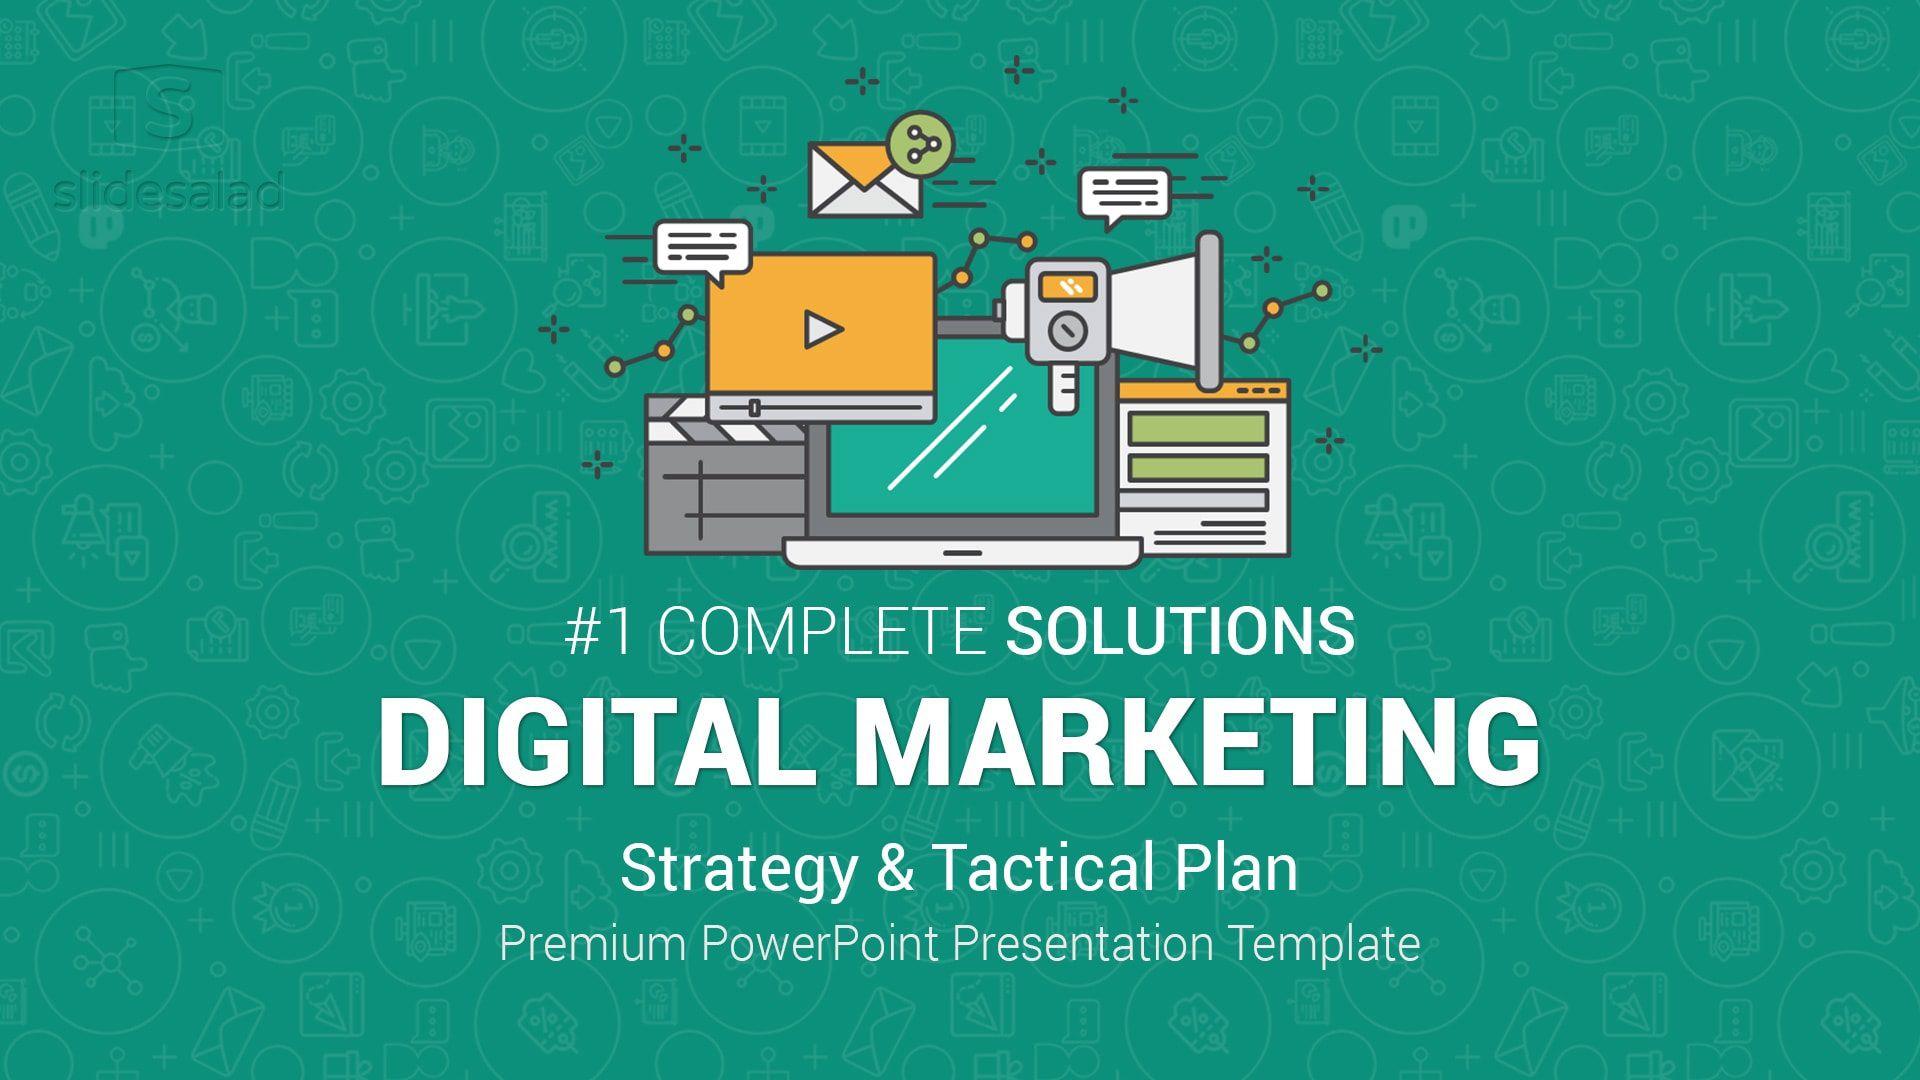 002 Unforgettable Free Digital Marketing Plan Template Ppt High Definition Full